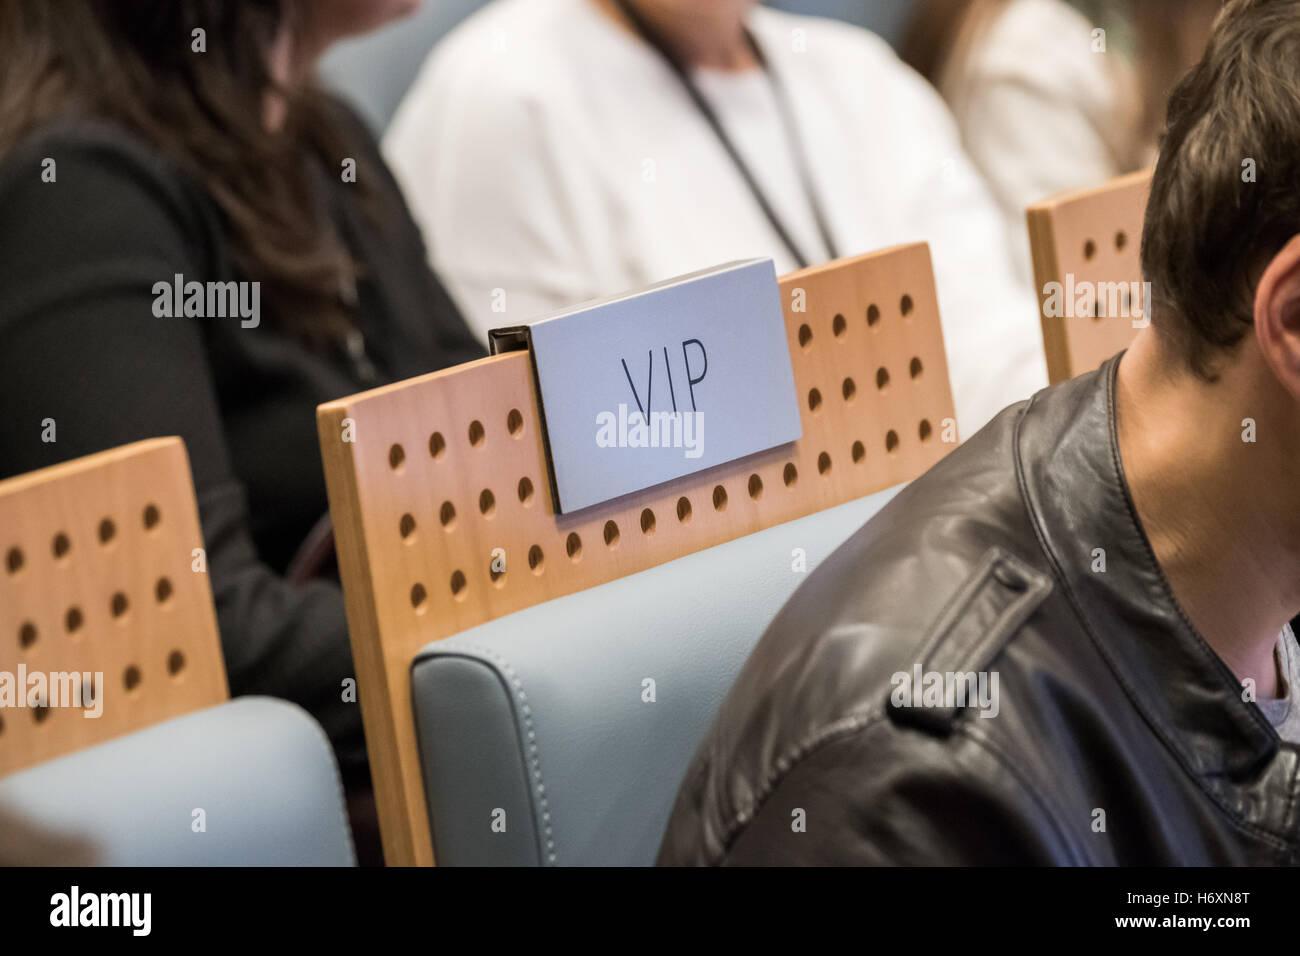 VIP seat at a hall - Stock Image